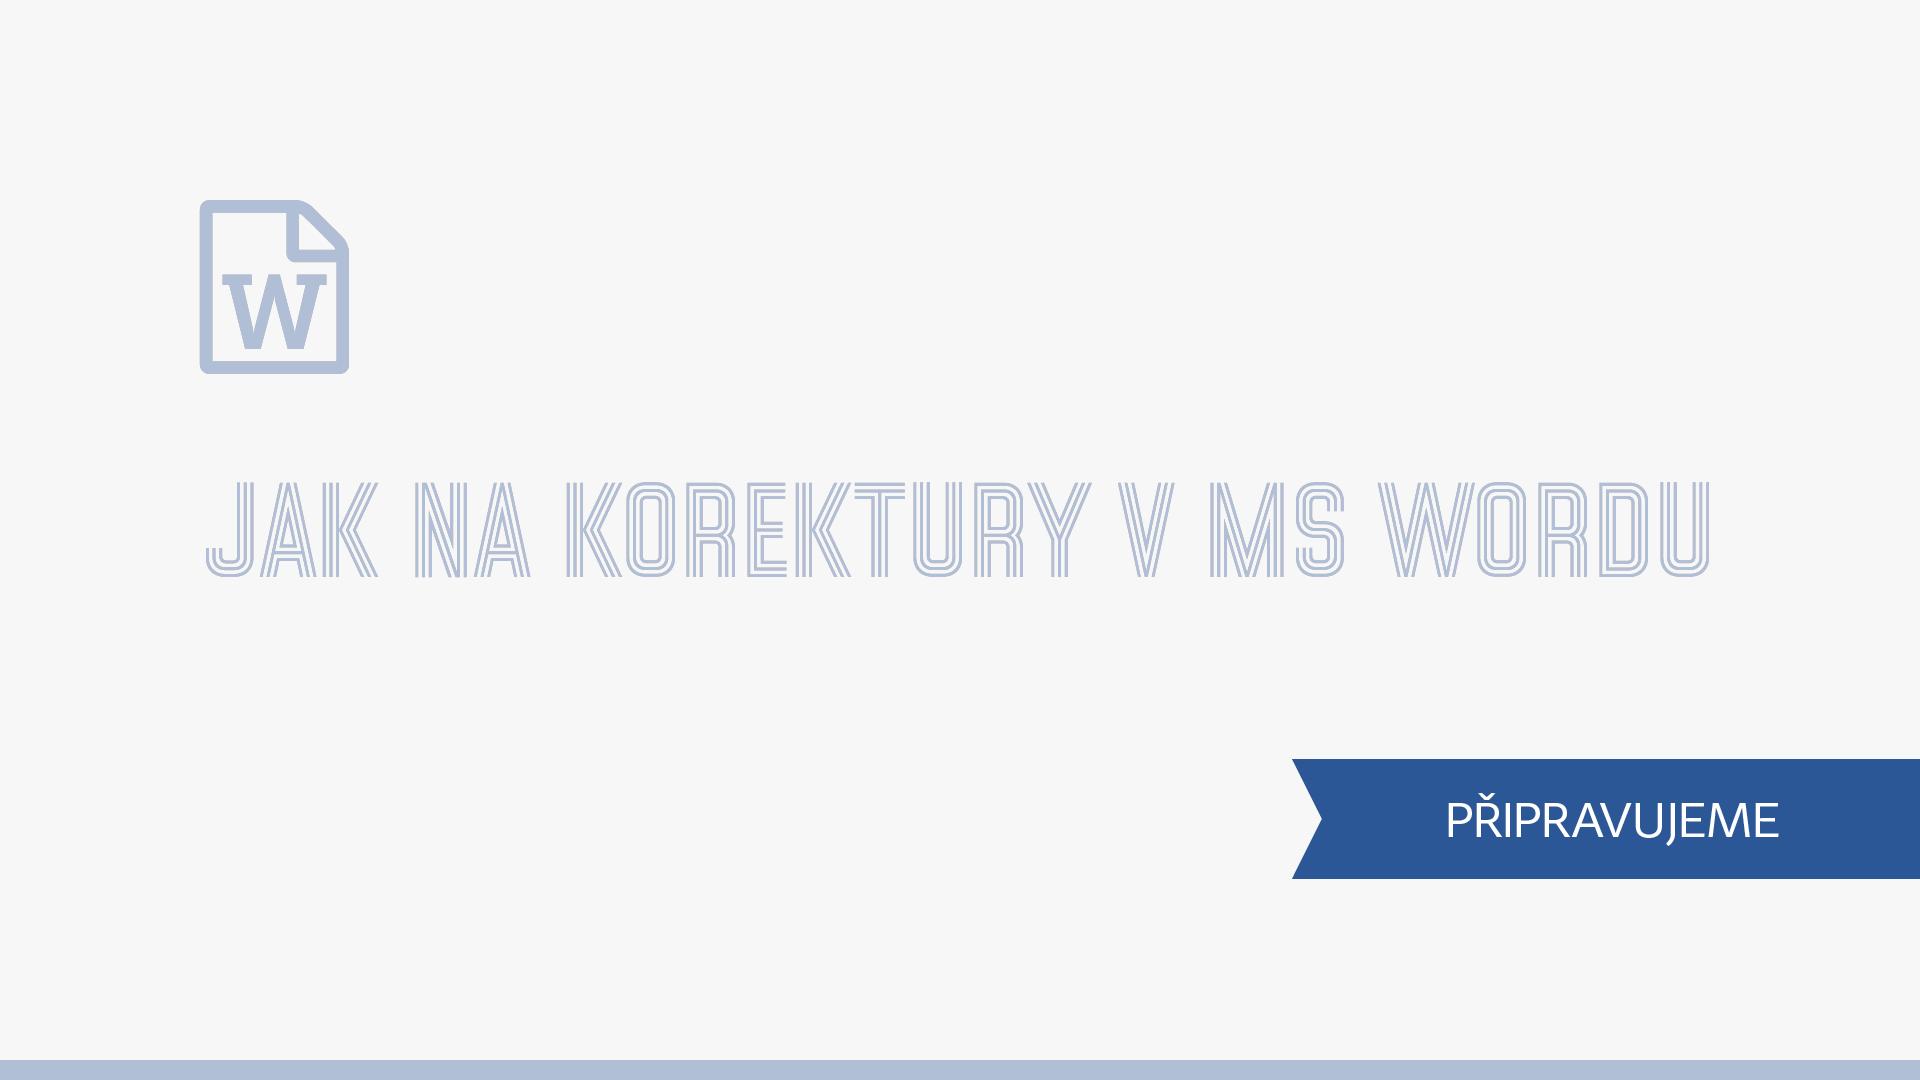 Jak-na-korektury-v-MS-Wordu_miniatura-PRIPRAVUJEME2